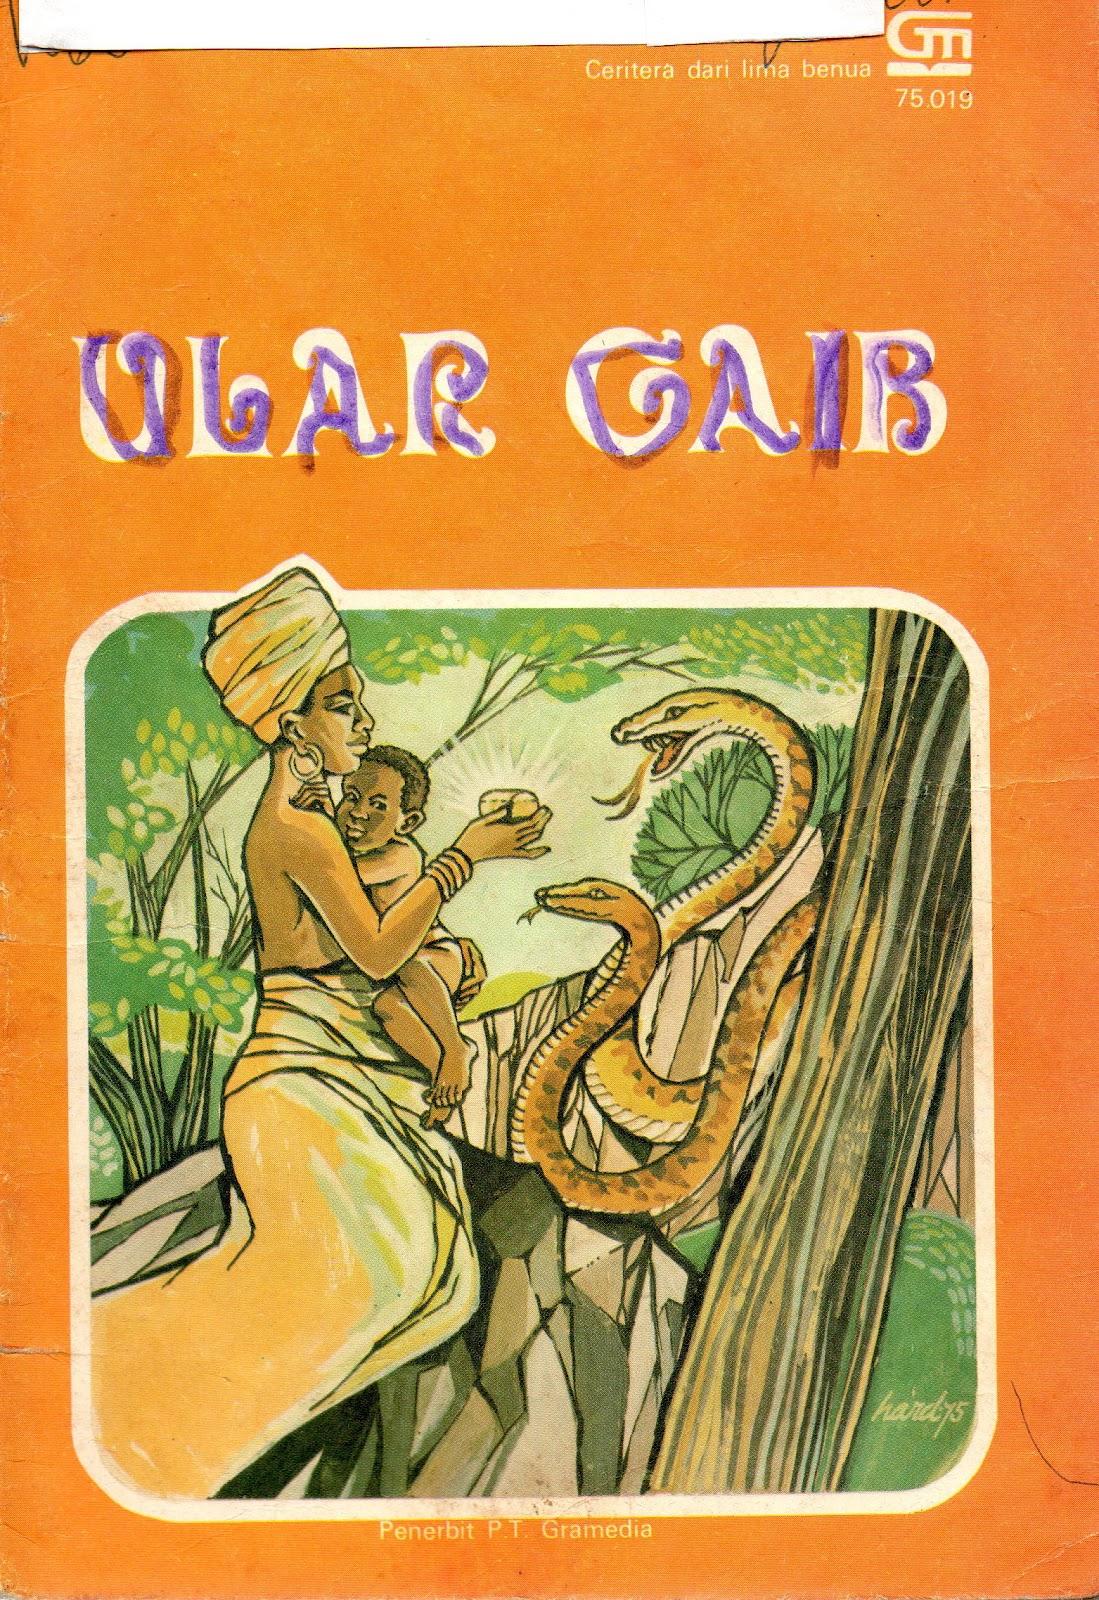 Cerita Dari Benua Afrika - Cerita Lima Benua